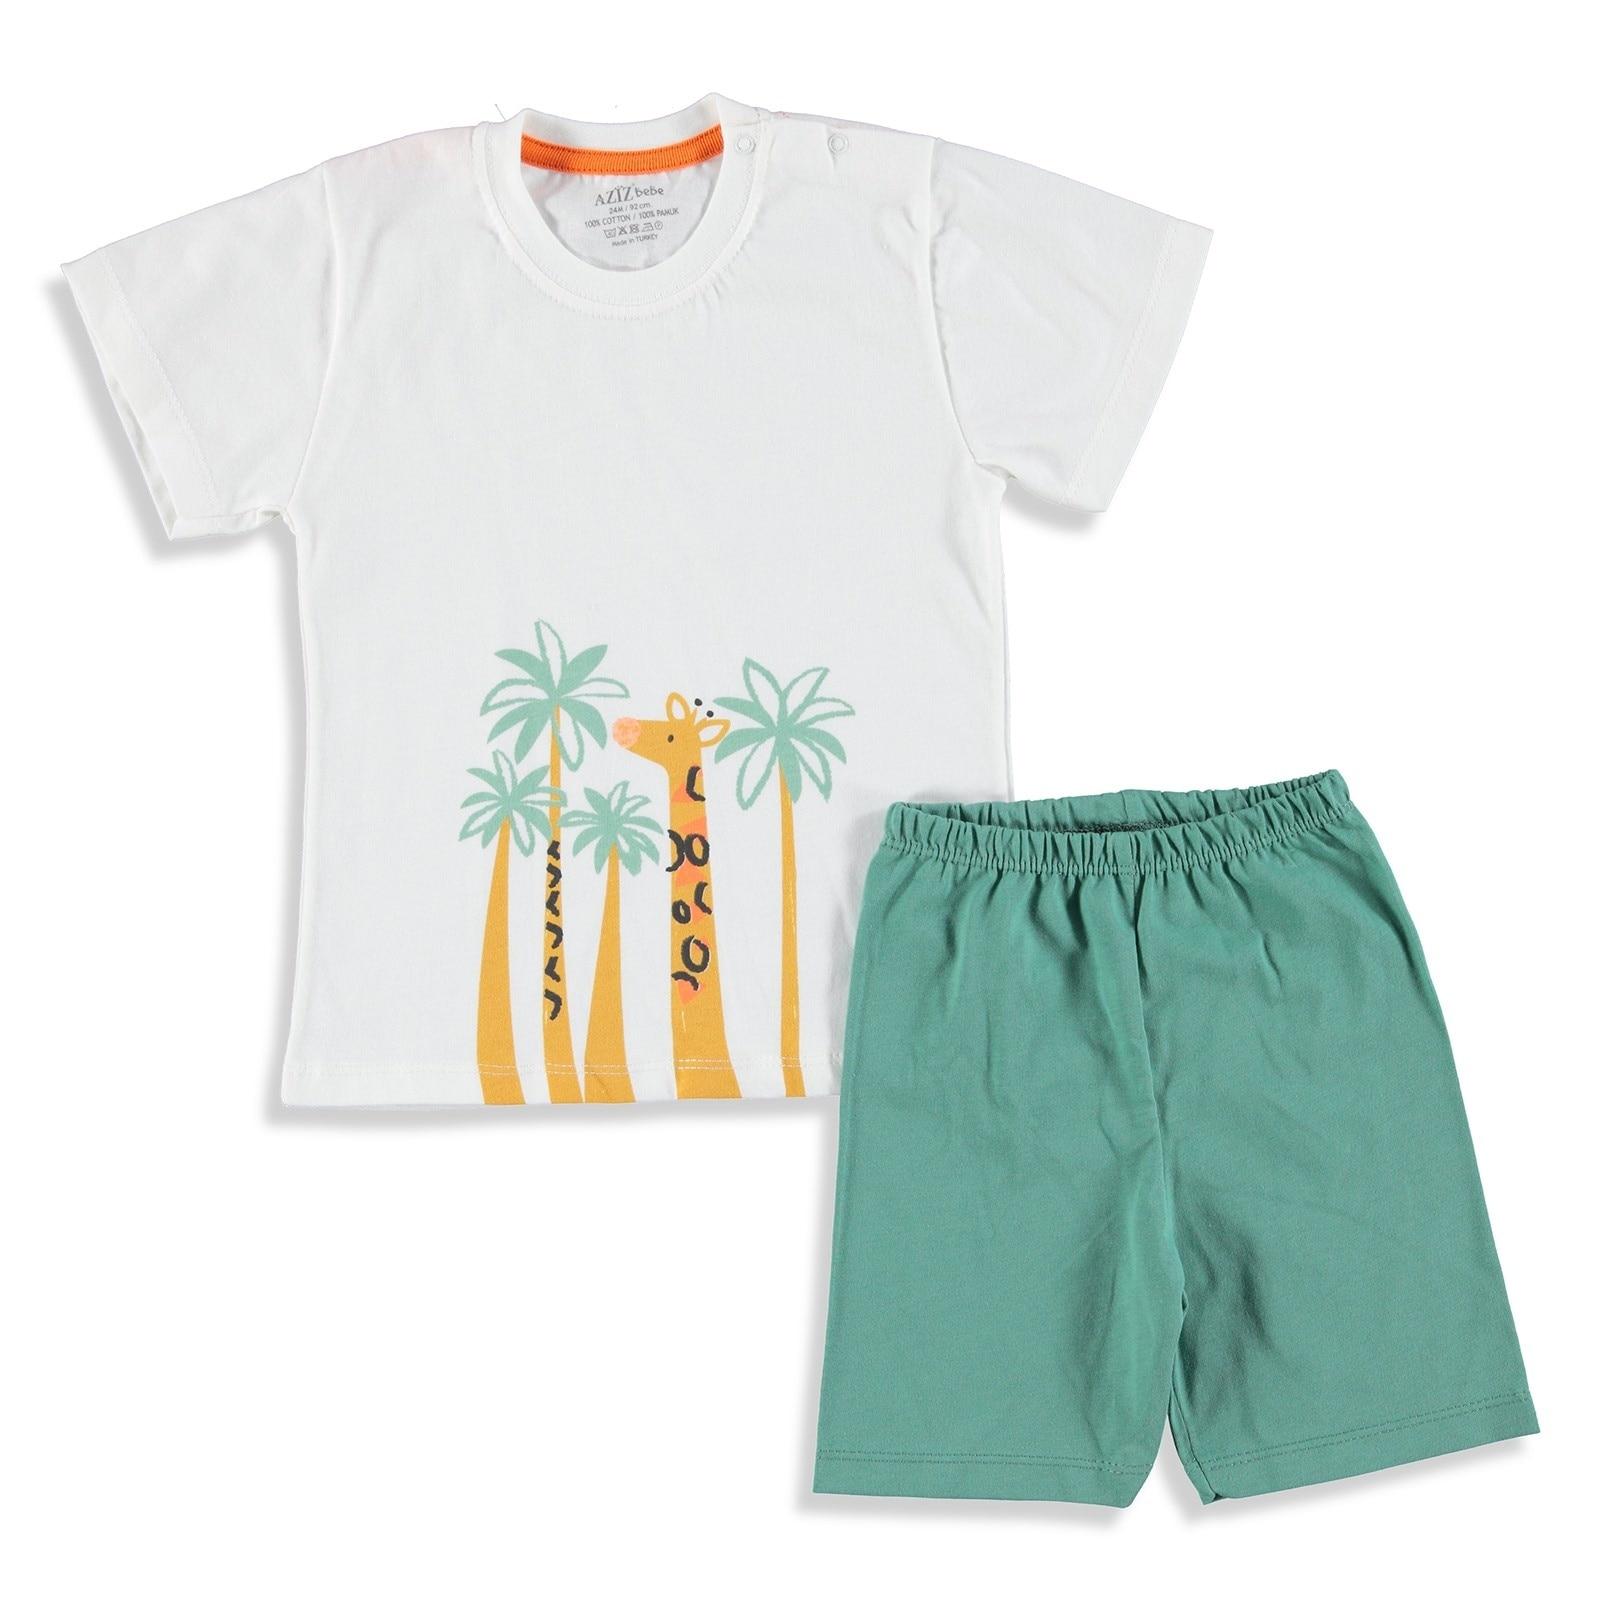 Ebebek Aziz Bebe Safari Baby Boy Tshirt Short Set